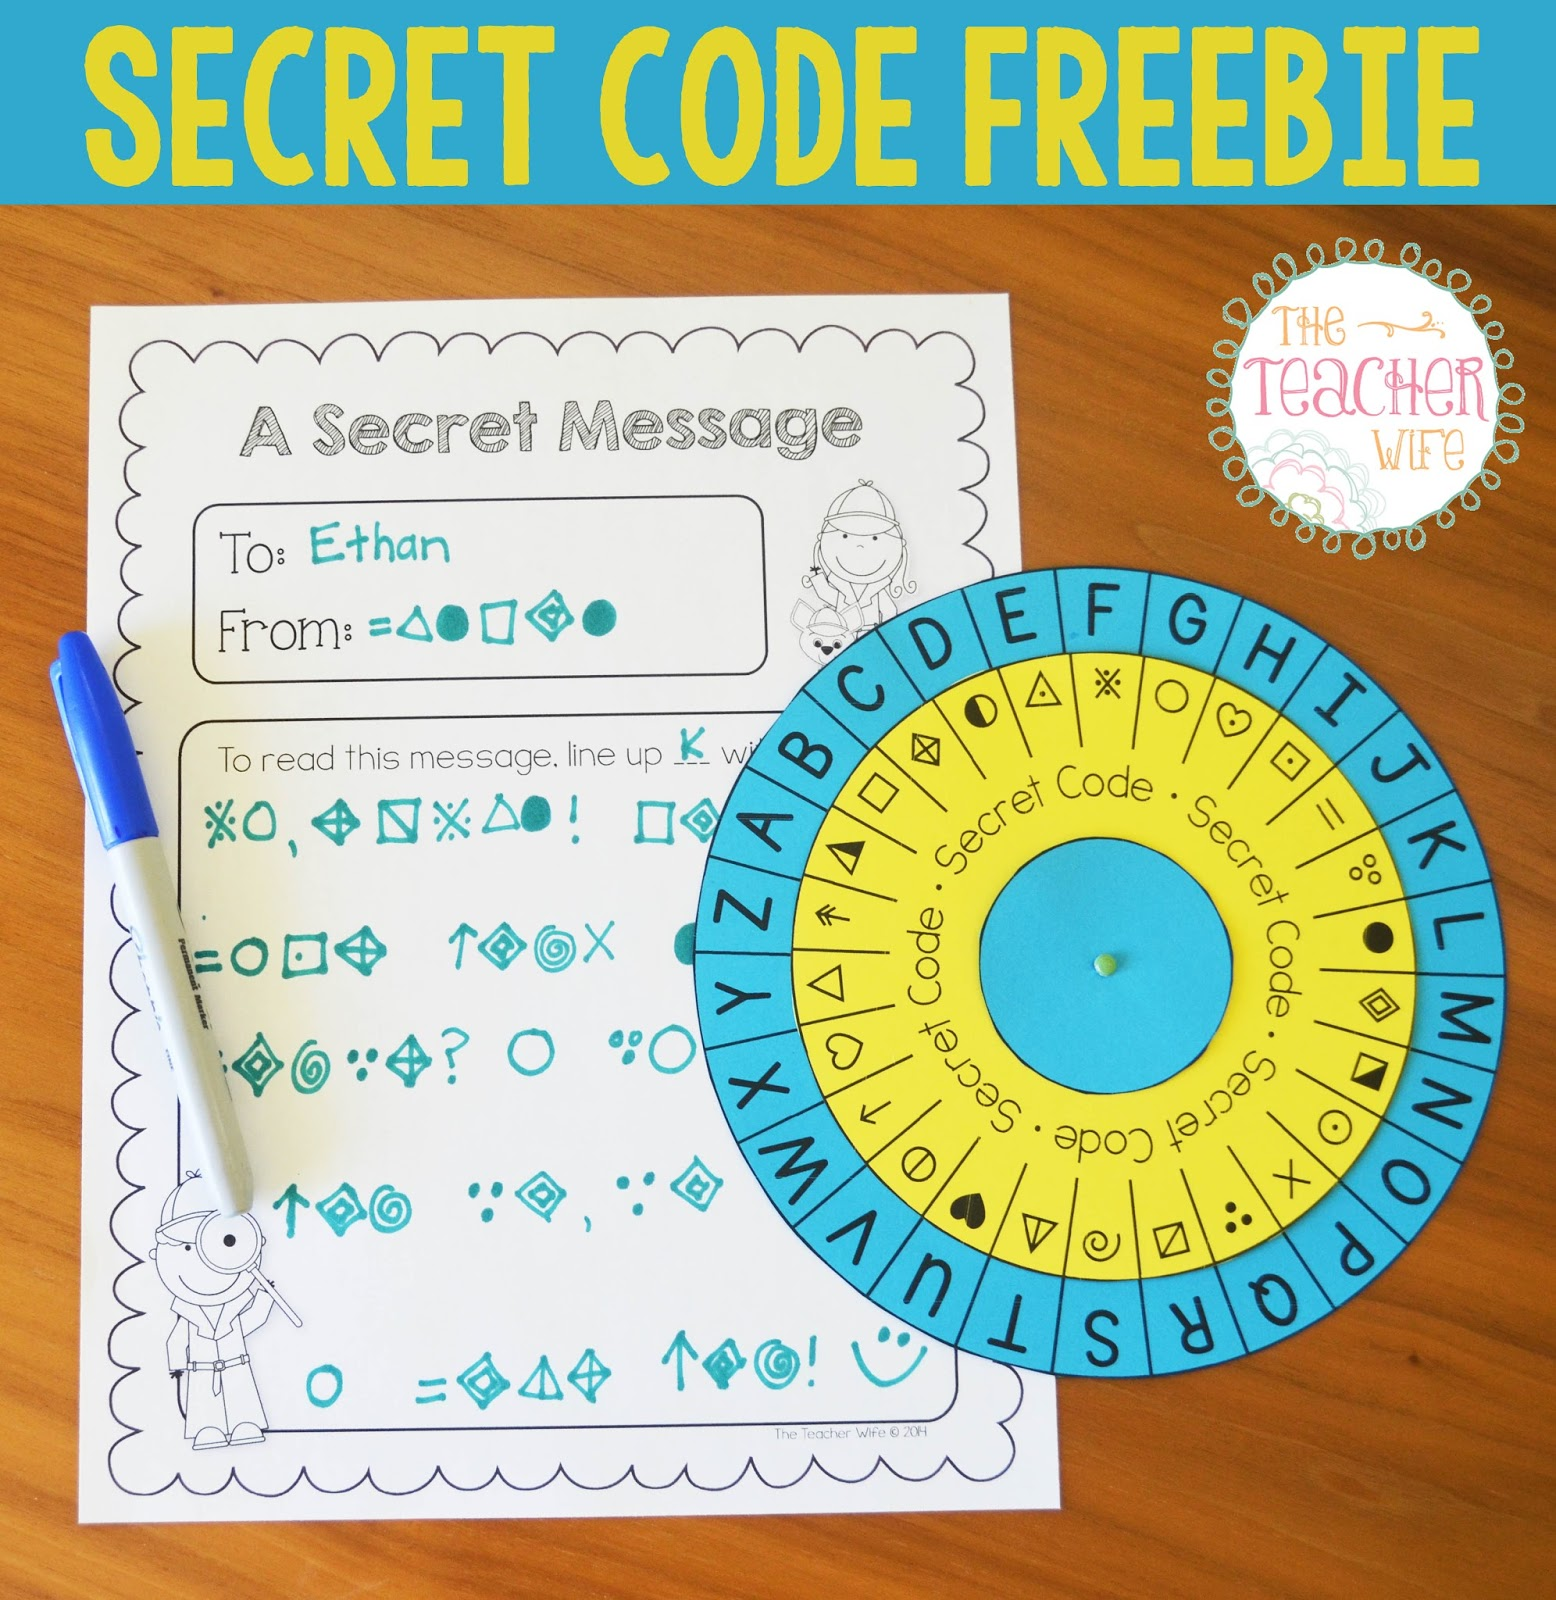 The Teacher Wife Secret Code Freebie